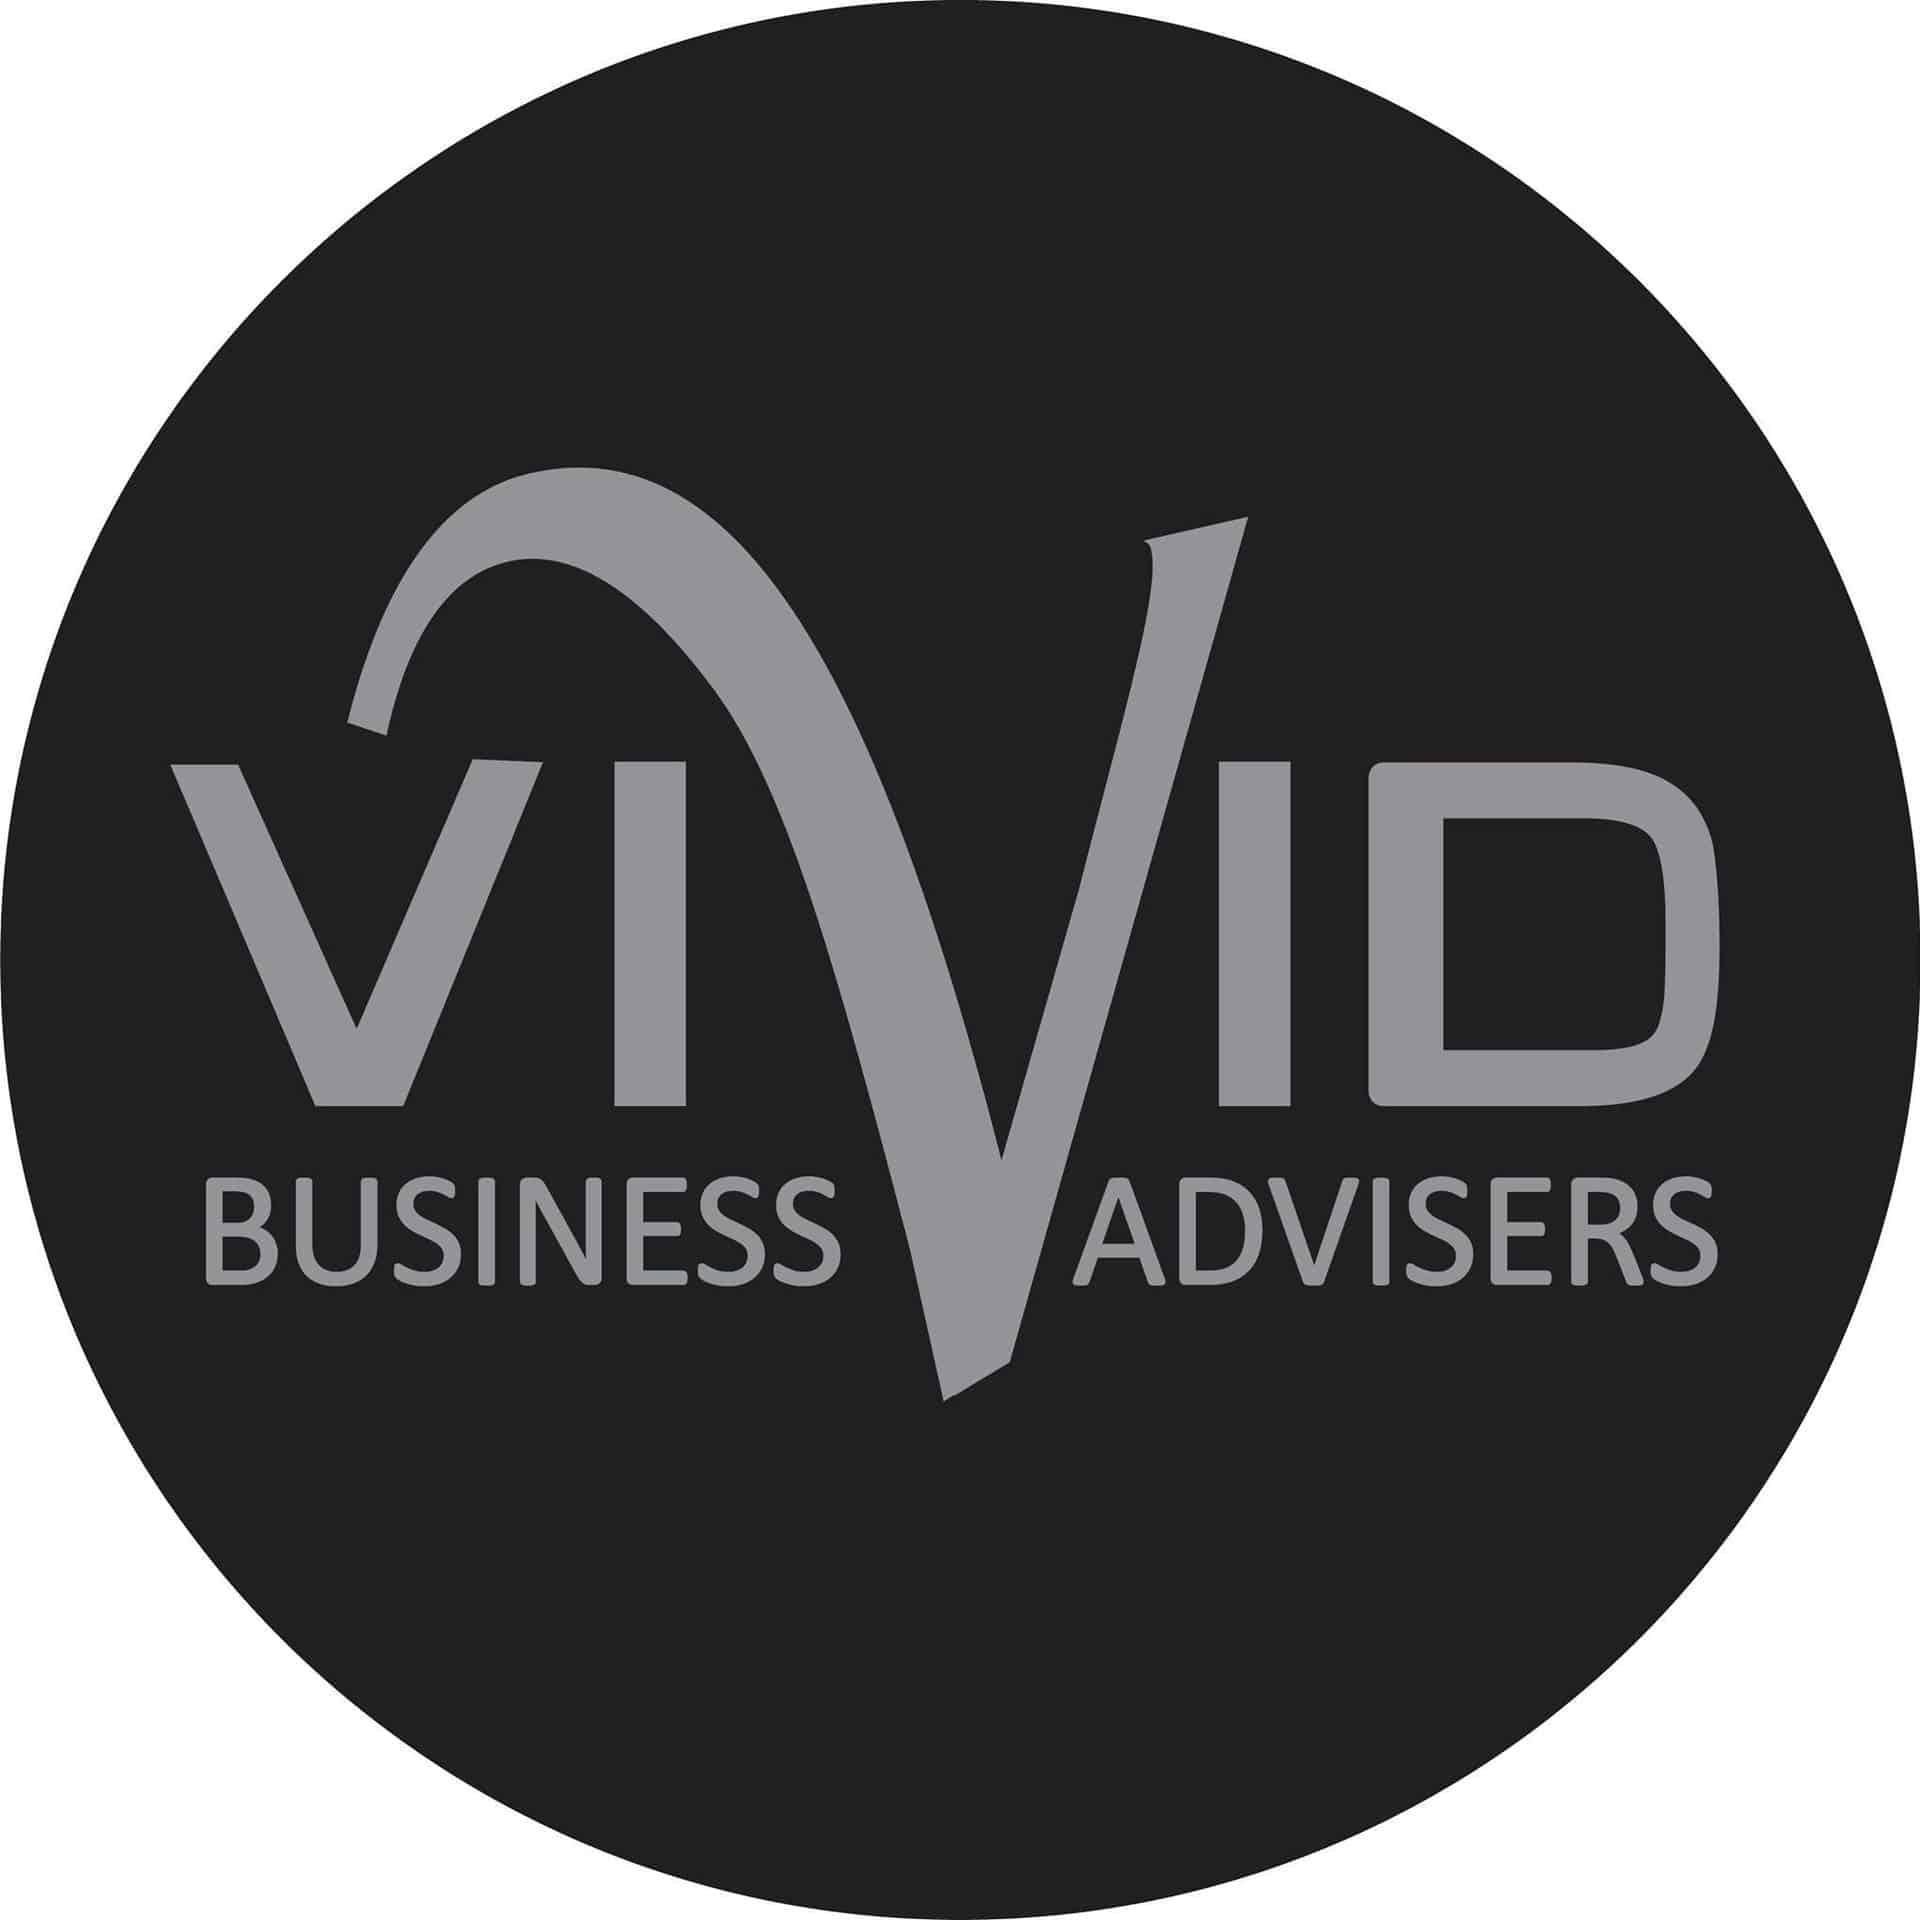 Vivid Accountants and Advisers